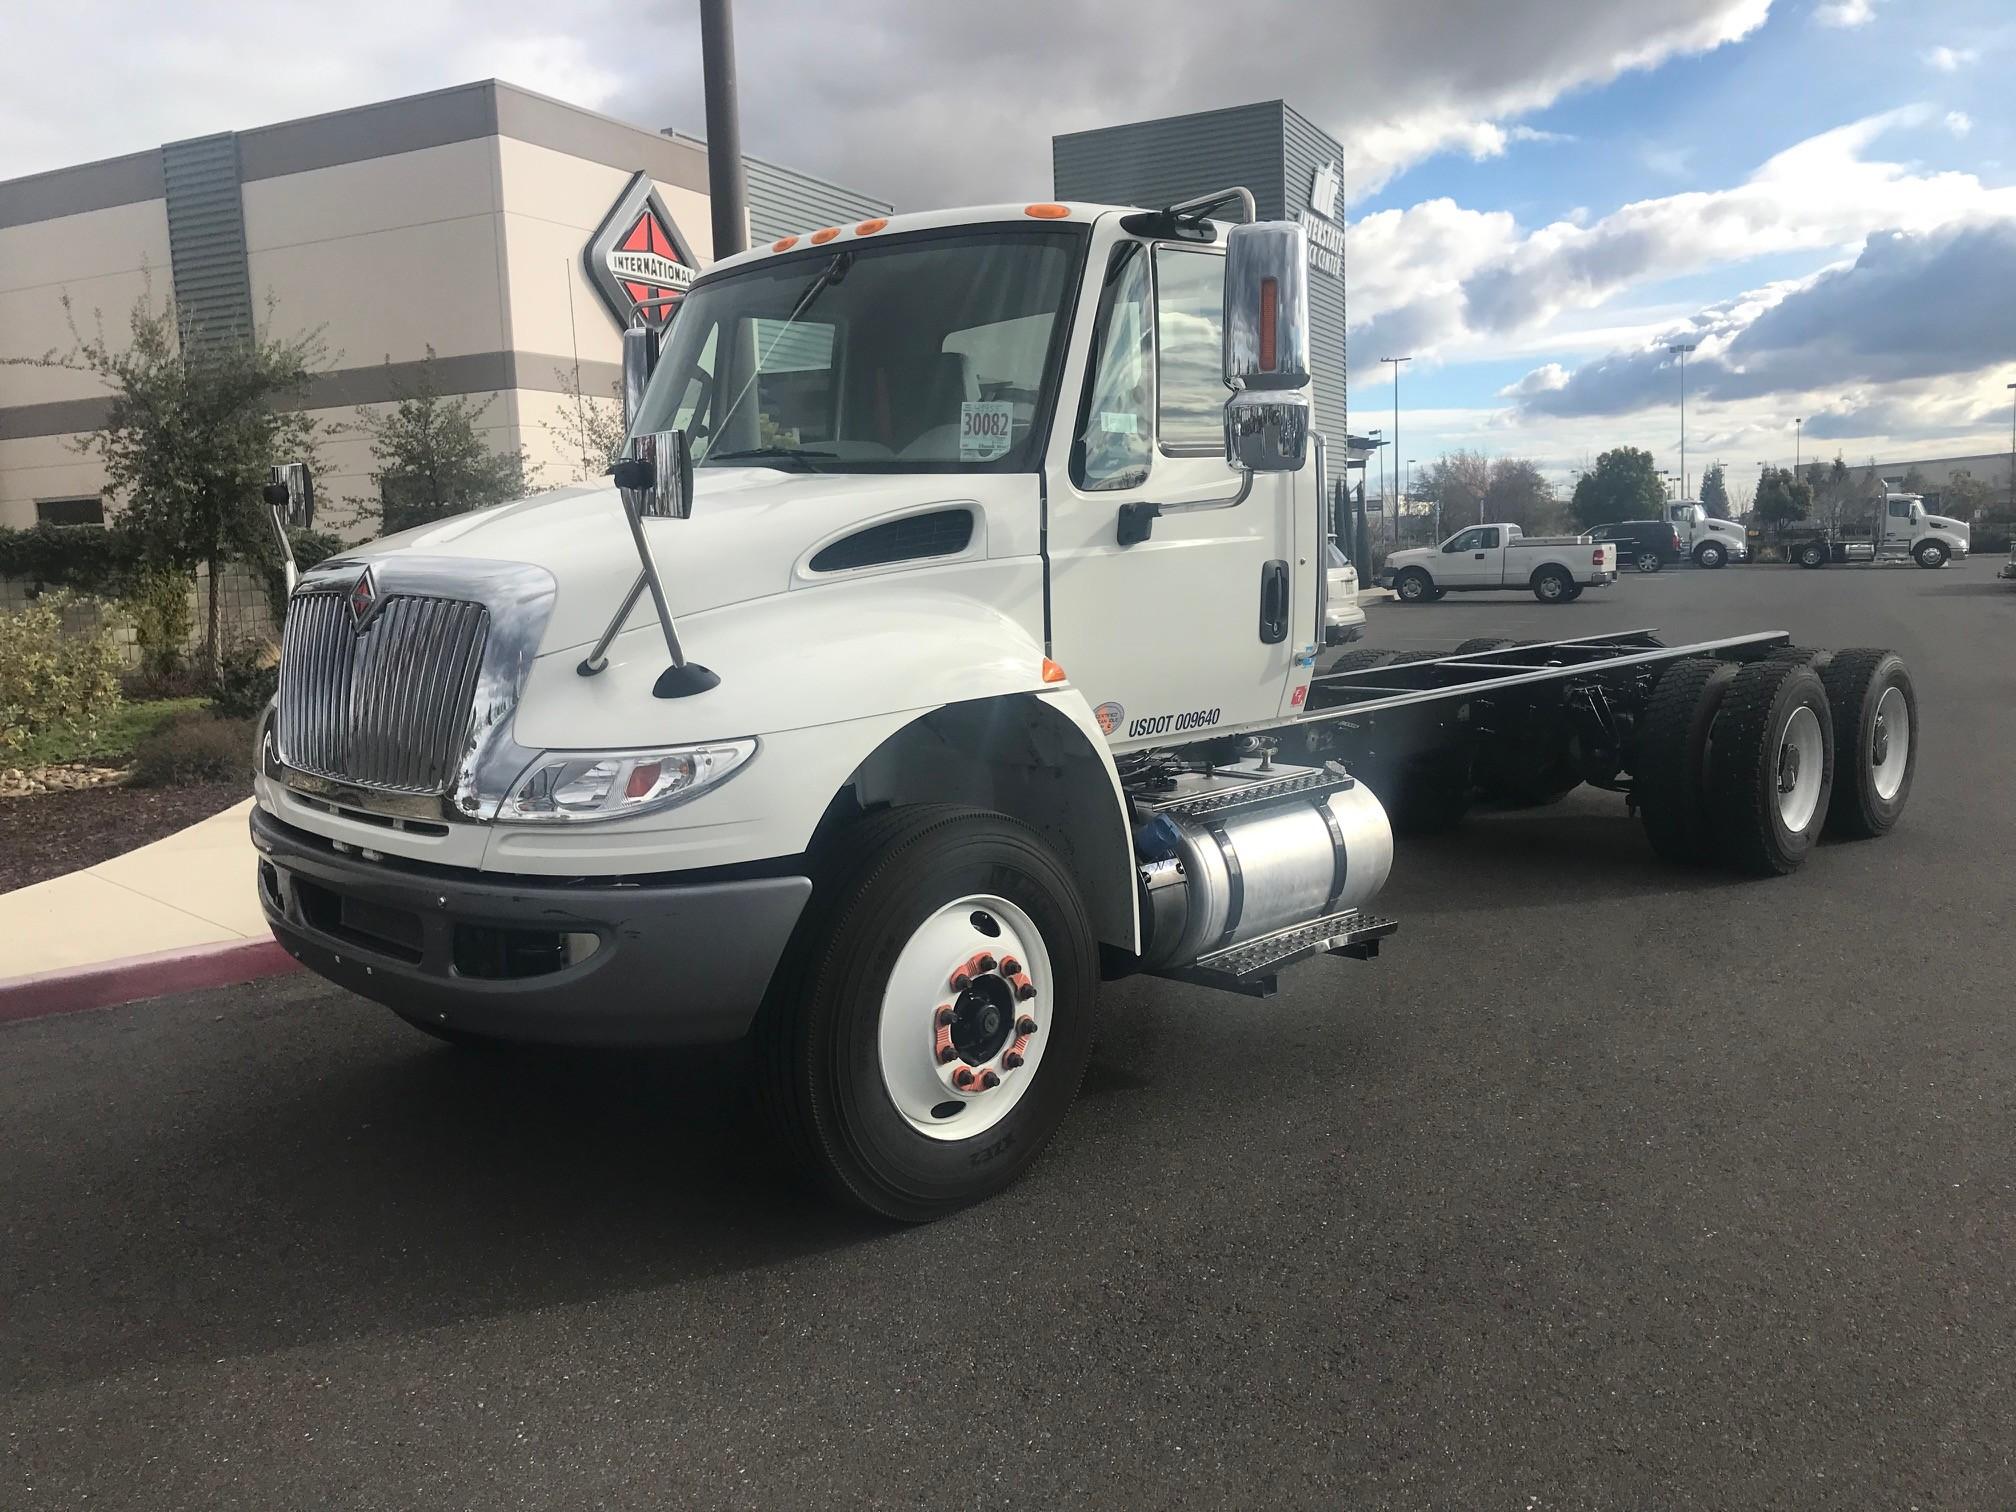 Used, 2018, International, 4400, Cab / Chassis Trucks